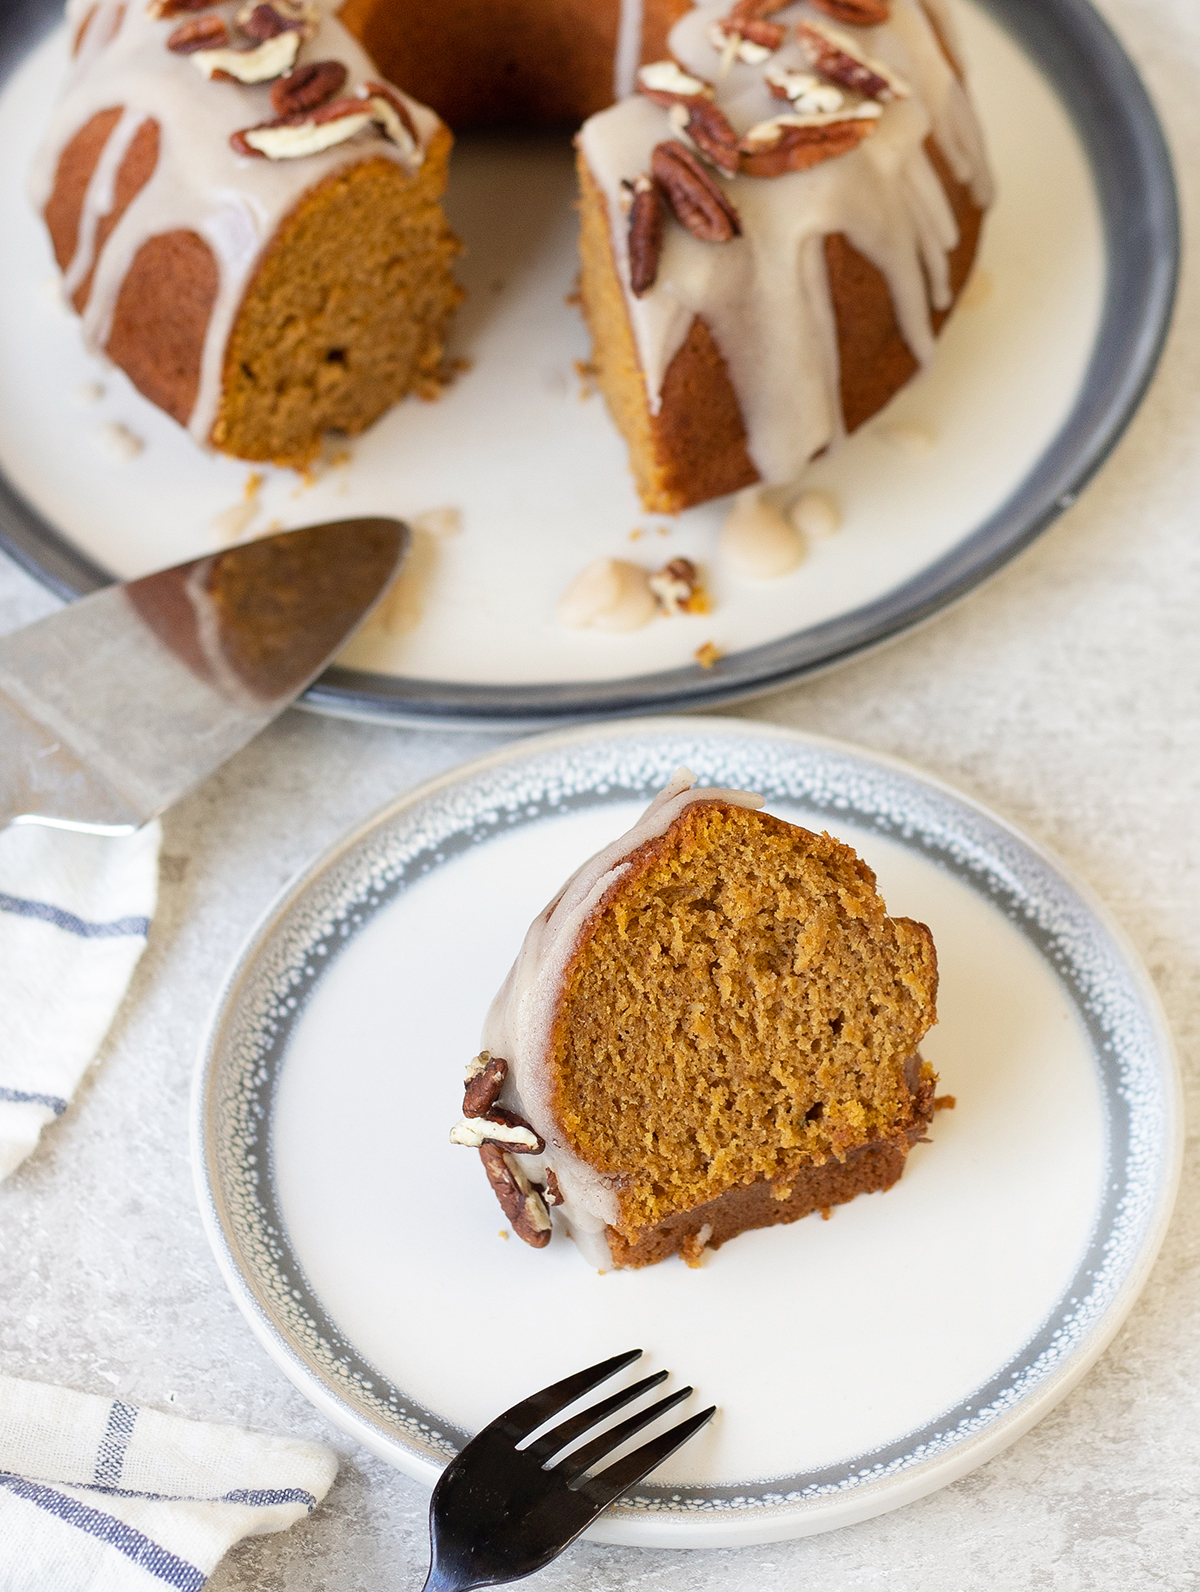 A slice of Sweet Potato Cake